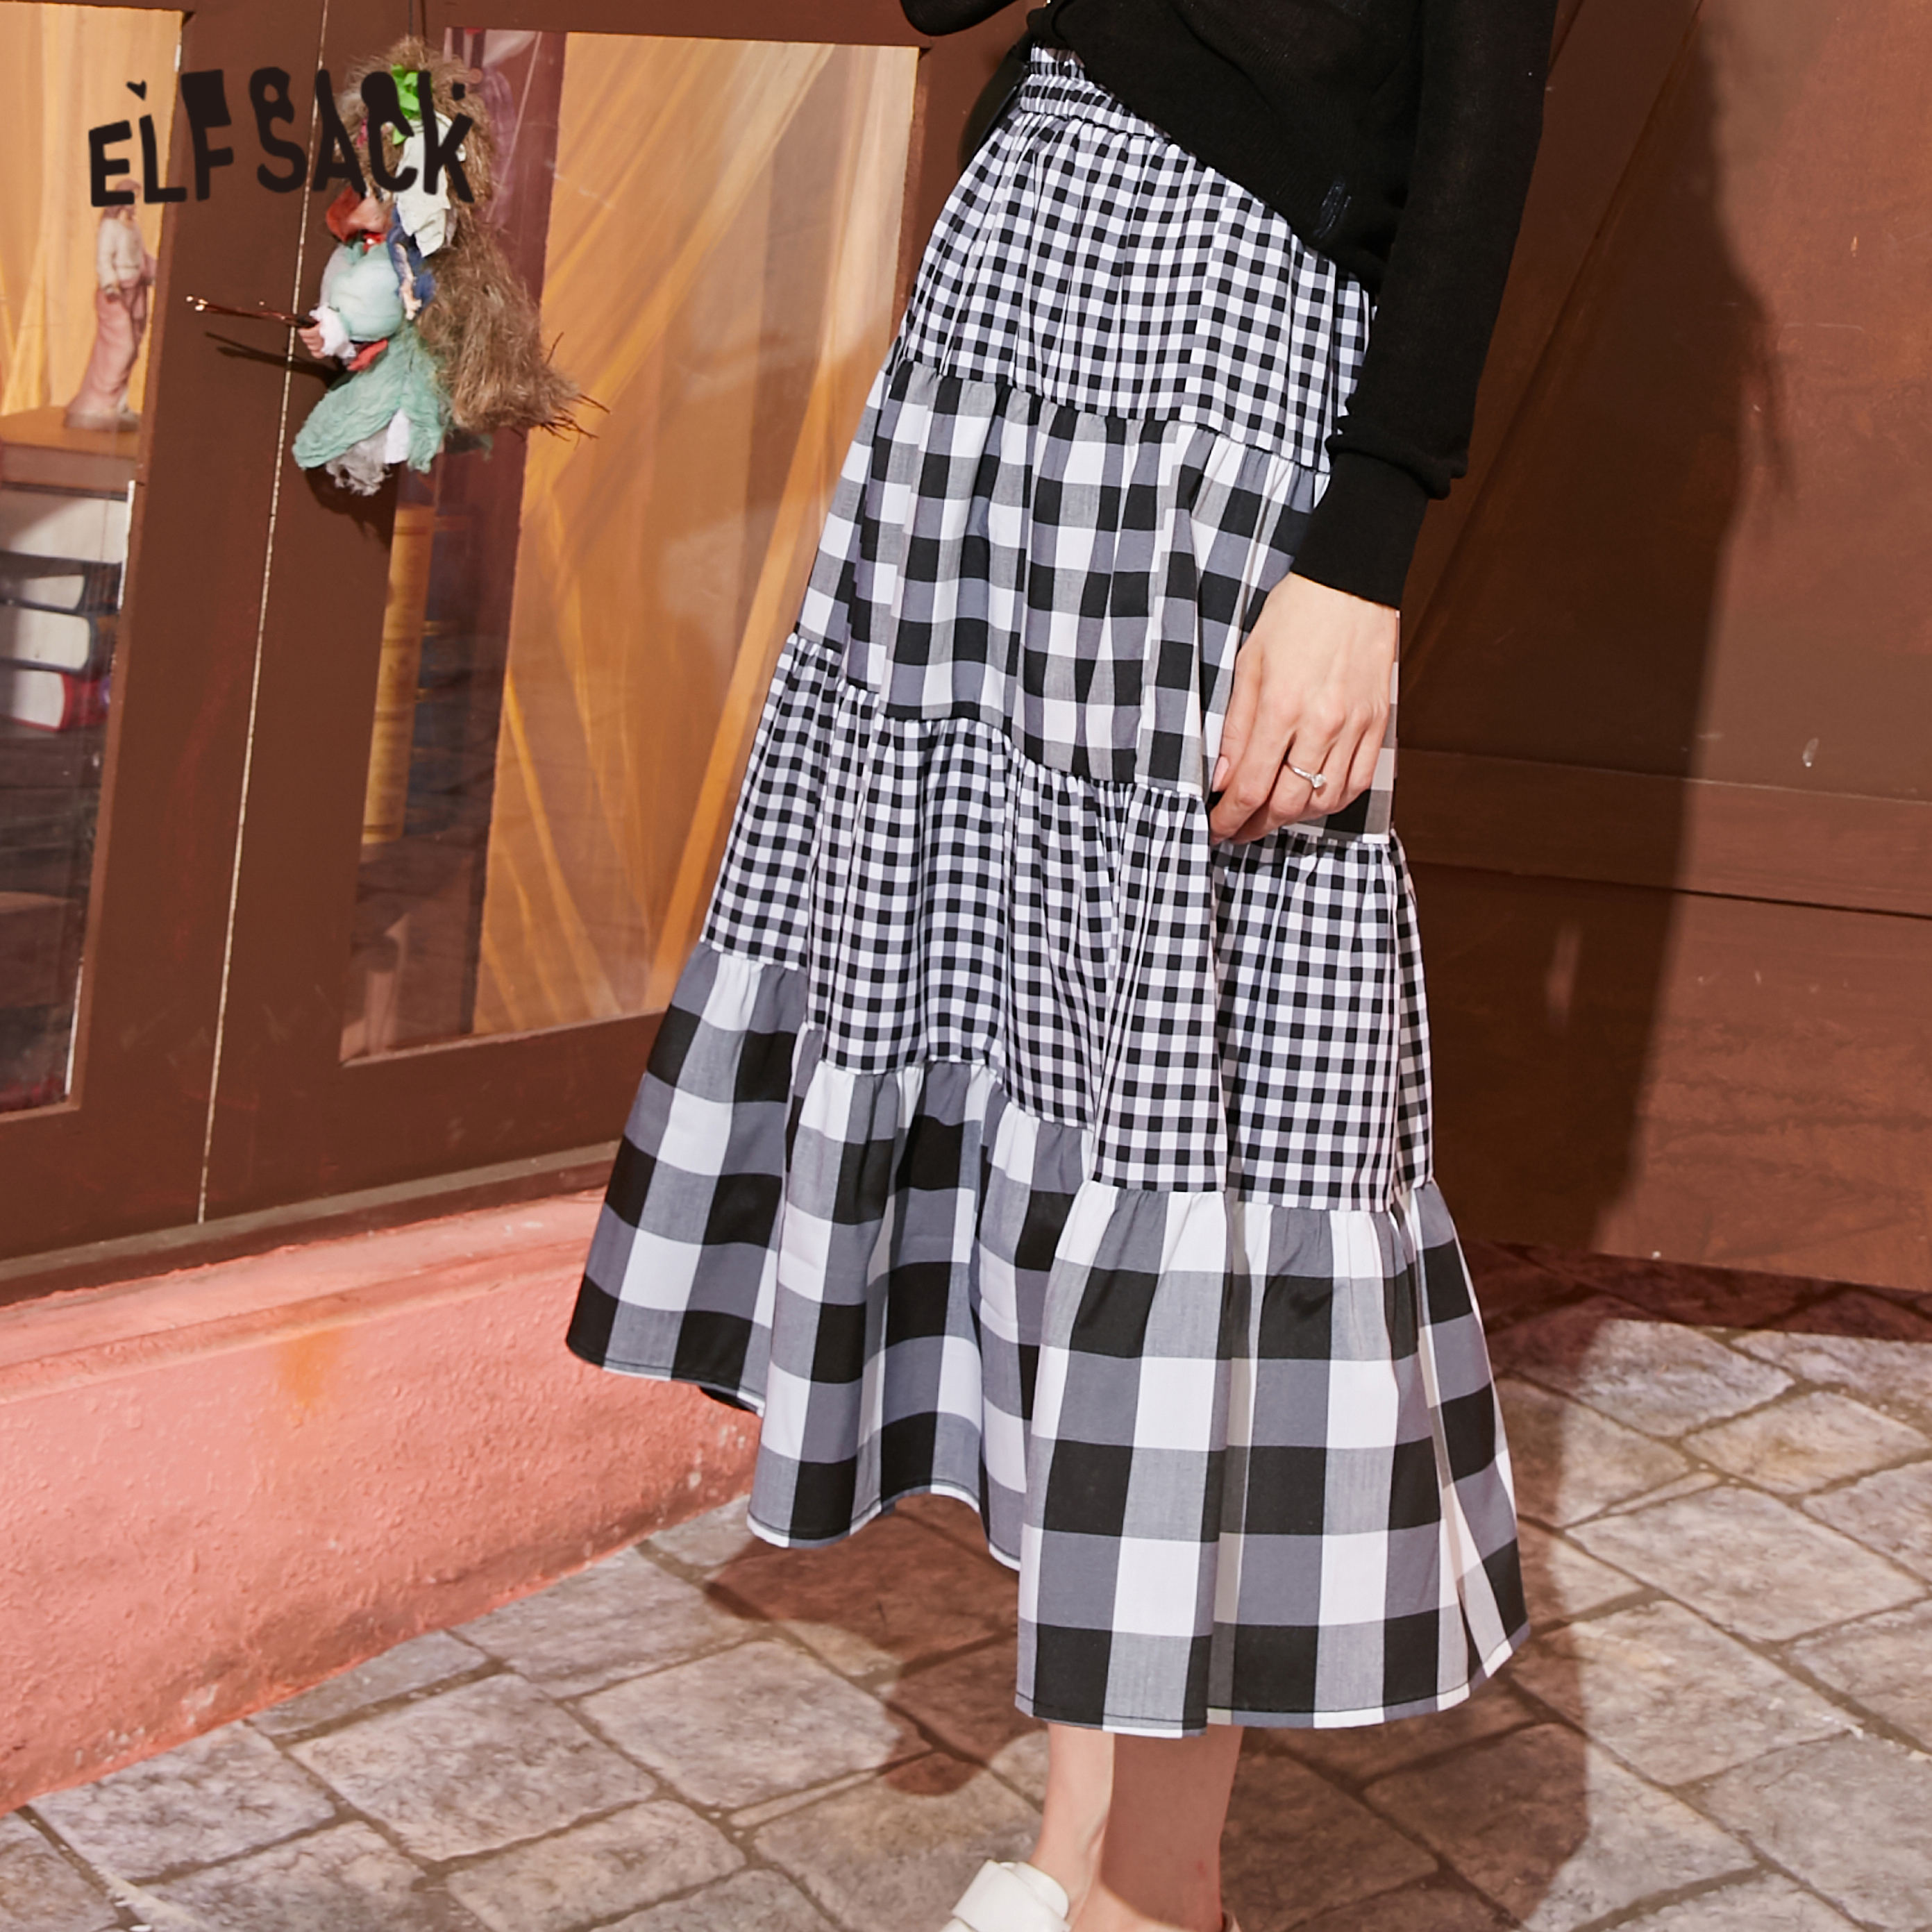 ELFSACK Black White Plaid Patchwork Casual Women Preppy Skirts 2020 Spring New Elegant Elastic Waist A Line Ladies Daily Skirt